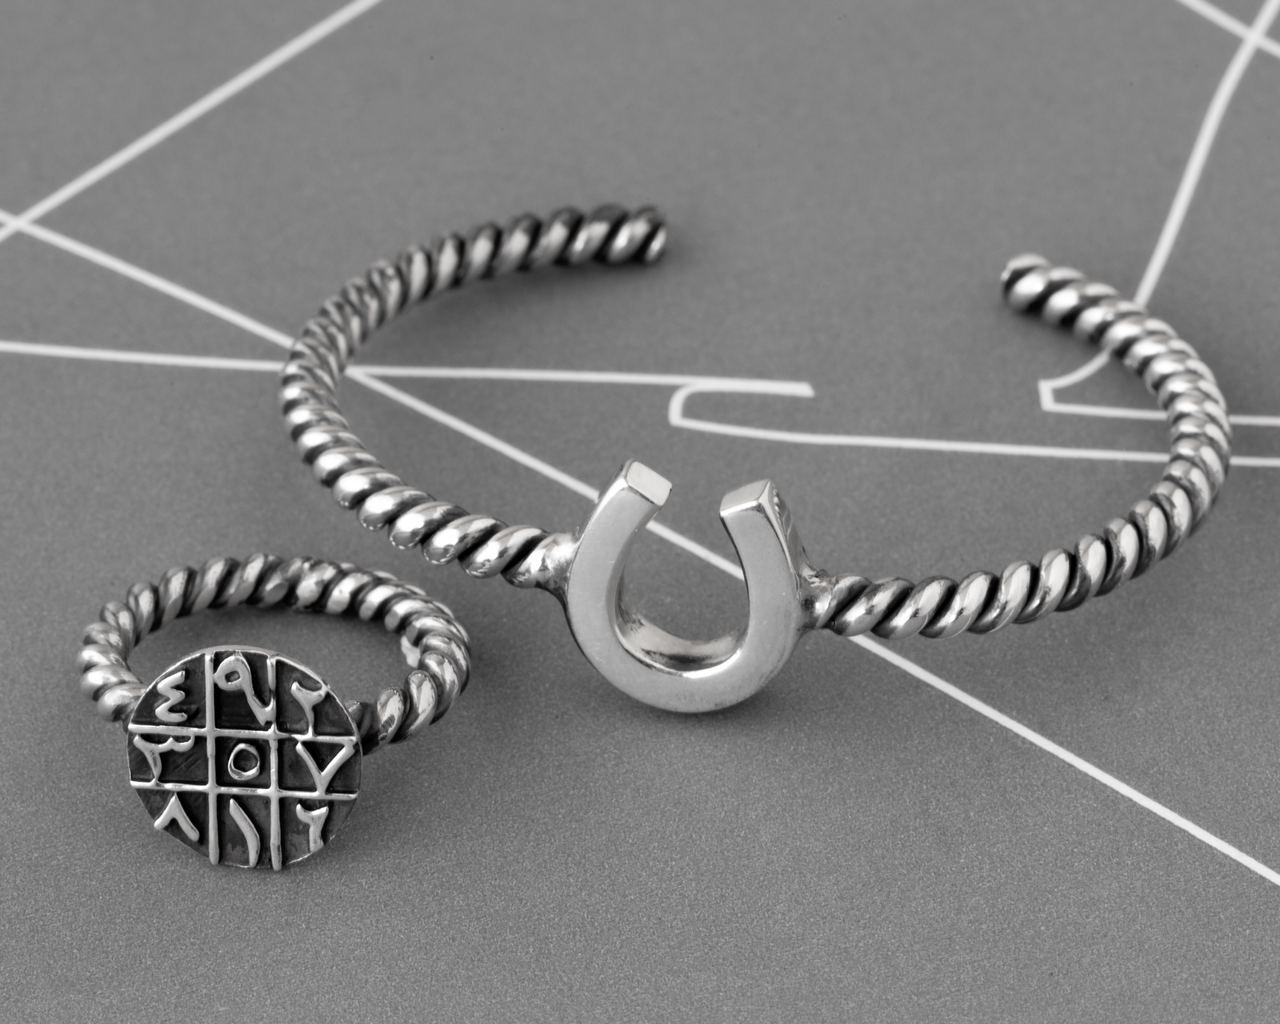 جواهرات اصیل و هیجان انگیز